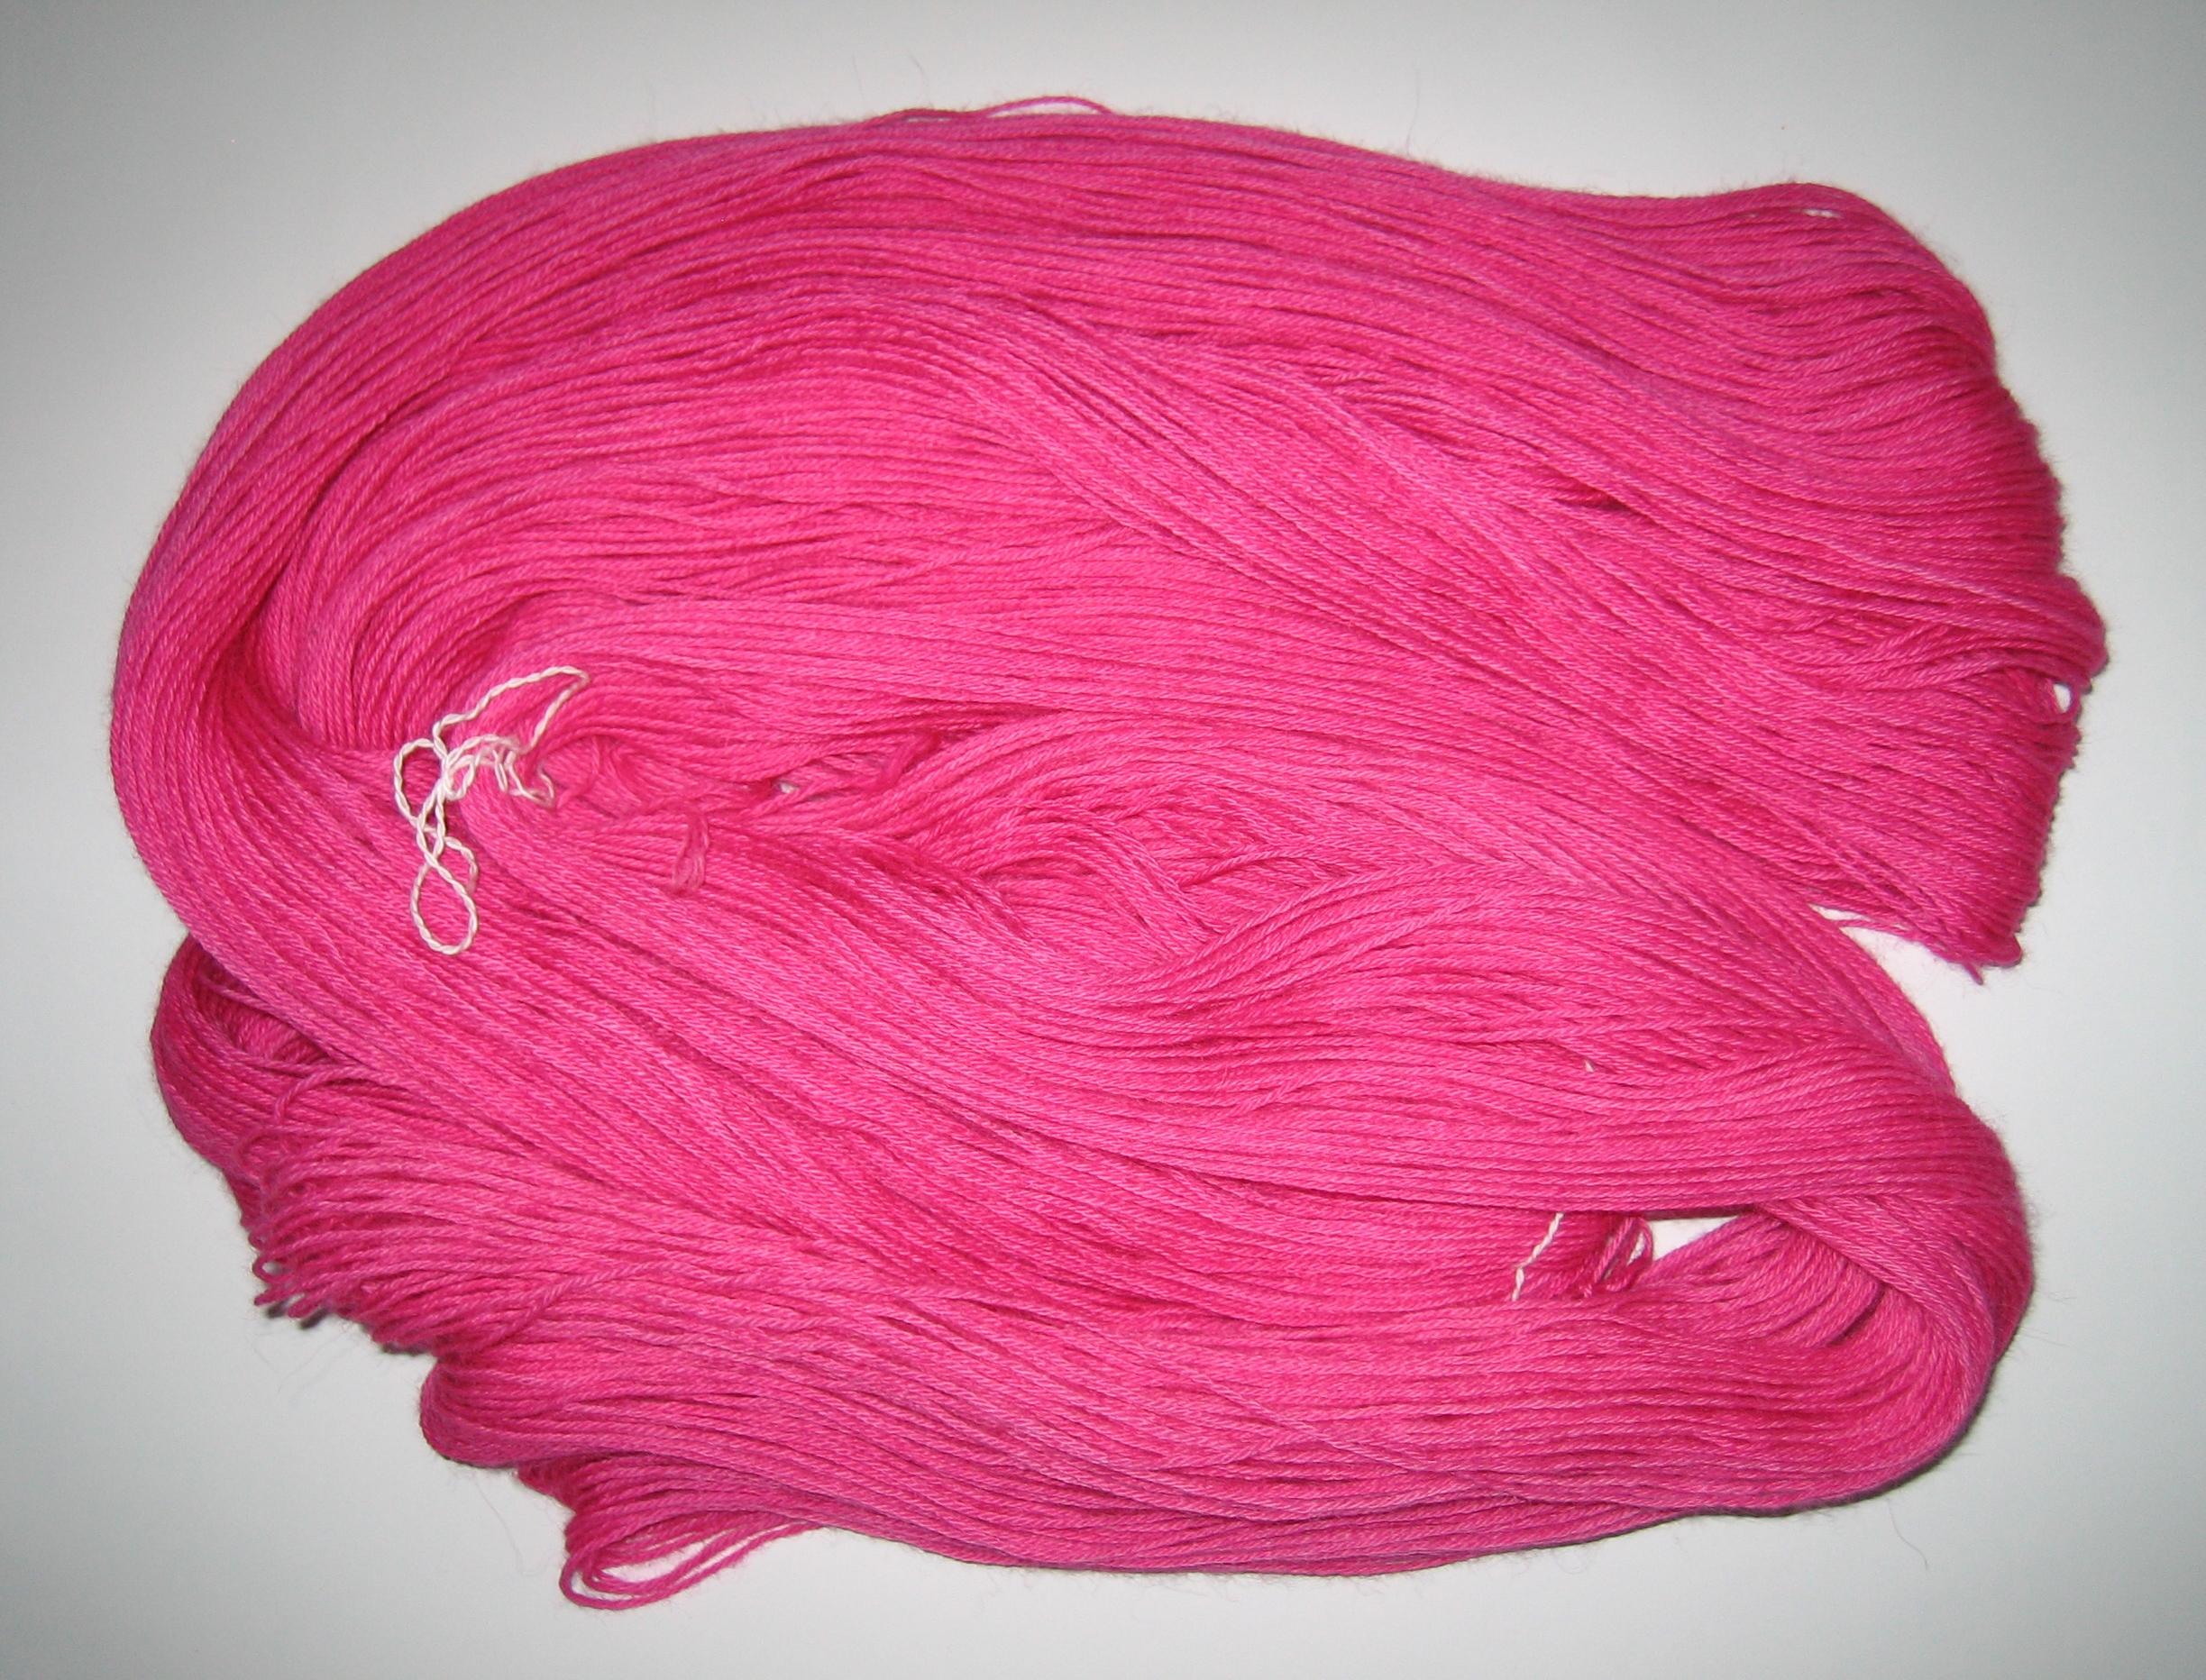 garnyarn-håndfarvet-garn-tynd-babyalpaka-moerklyseroed